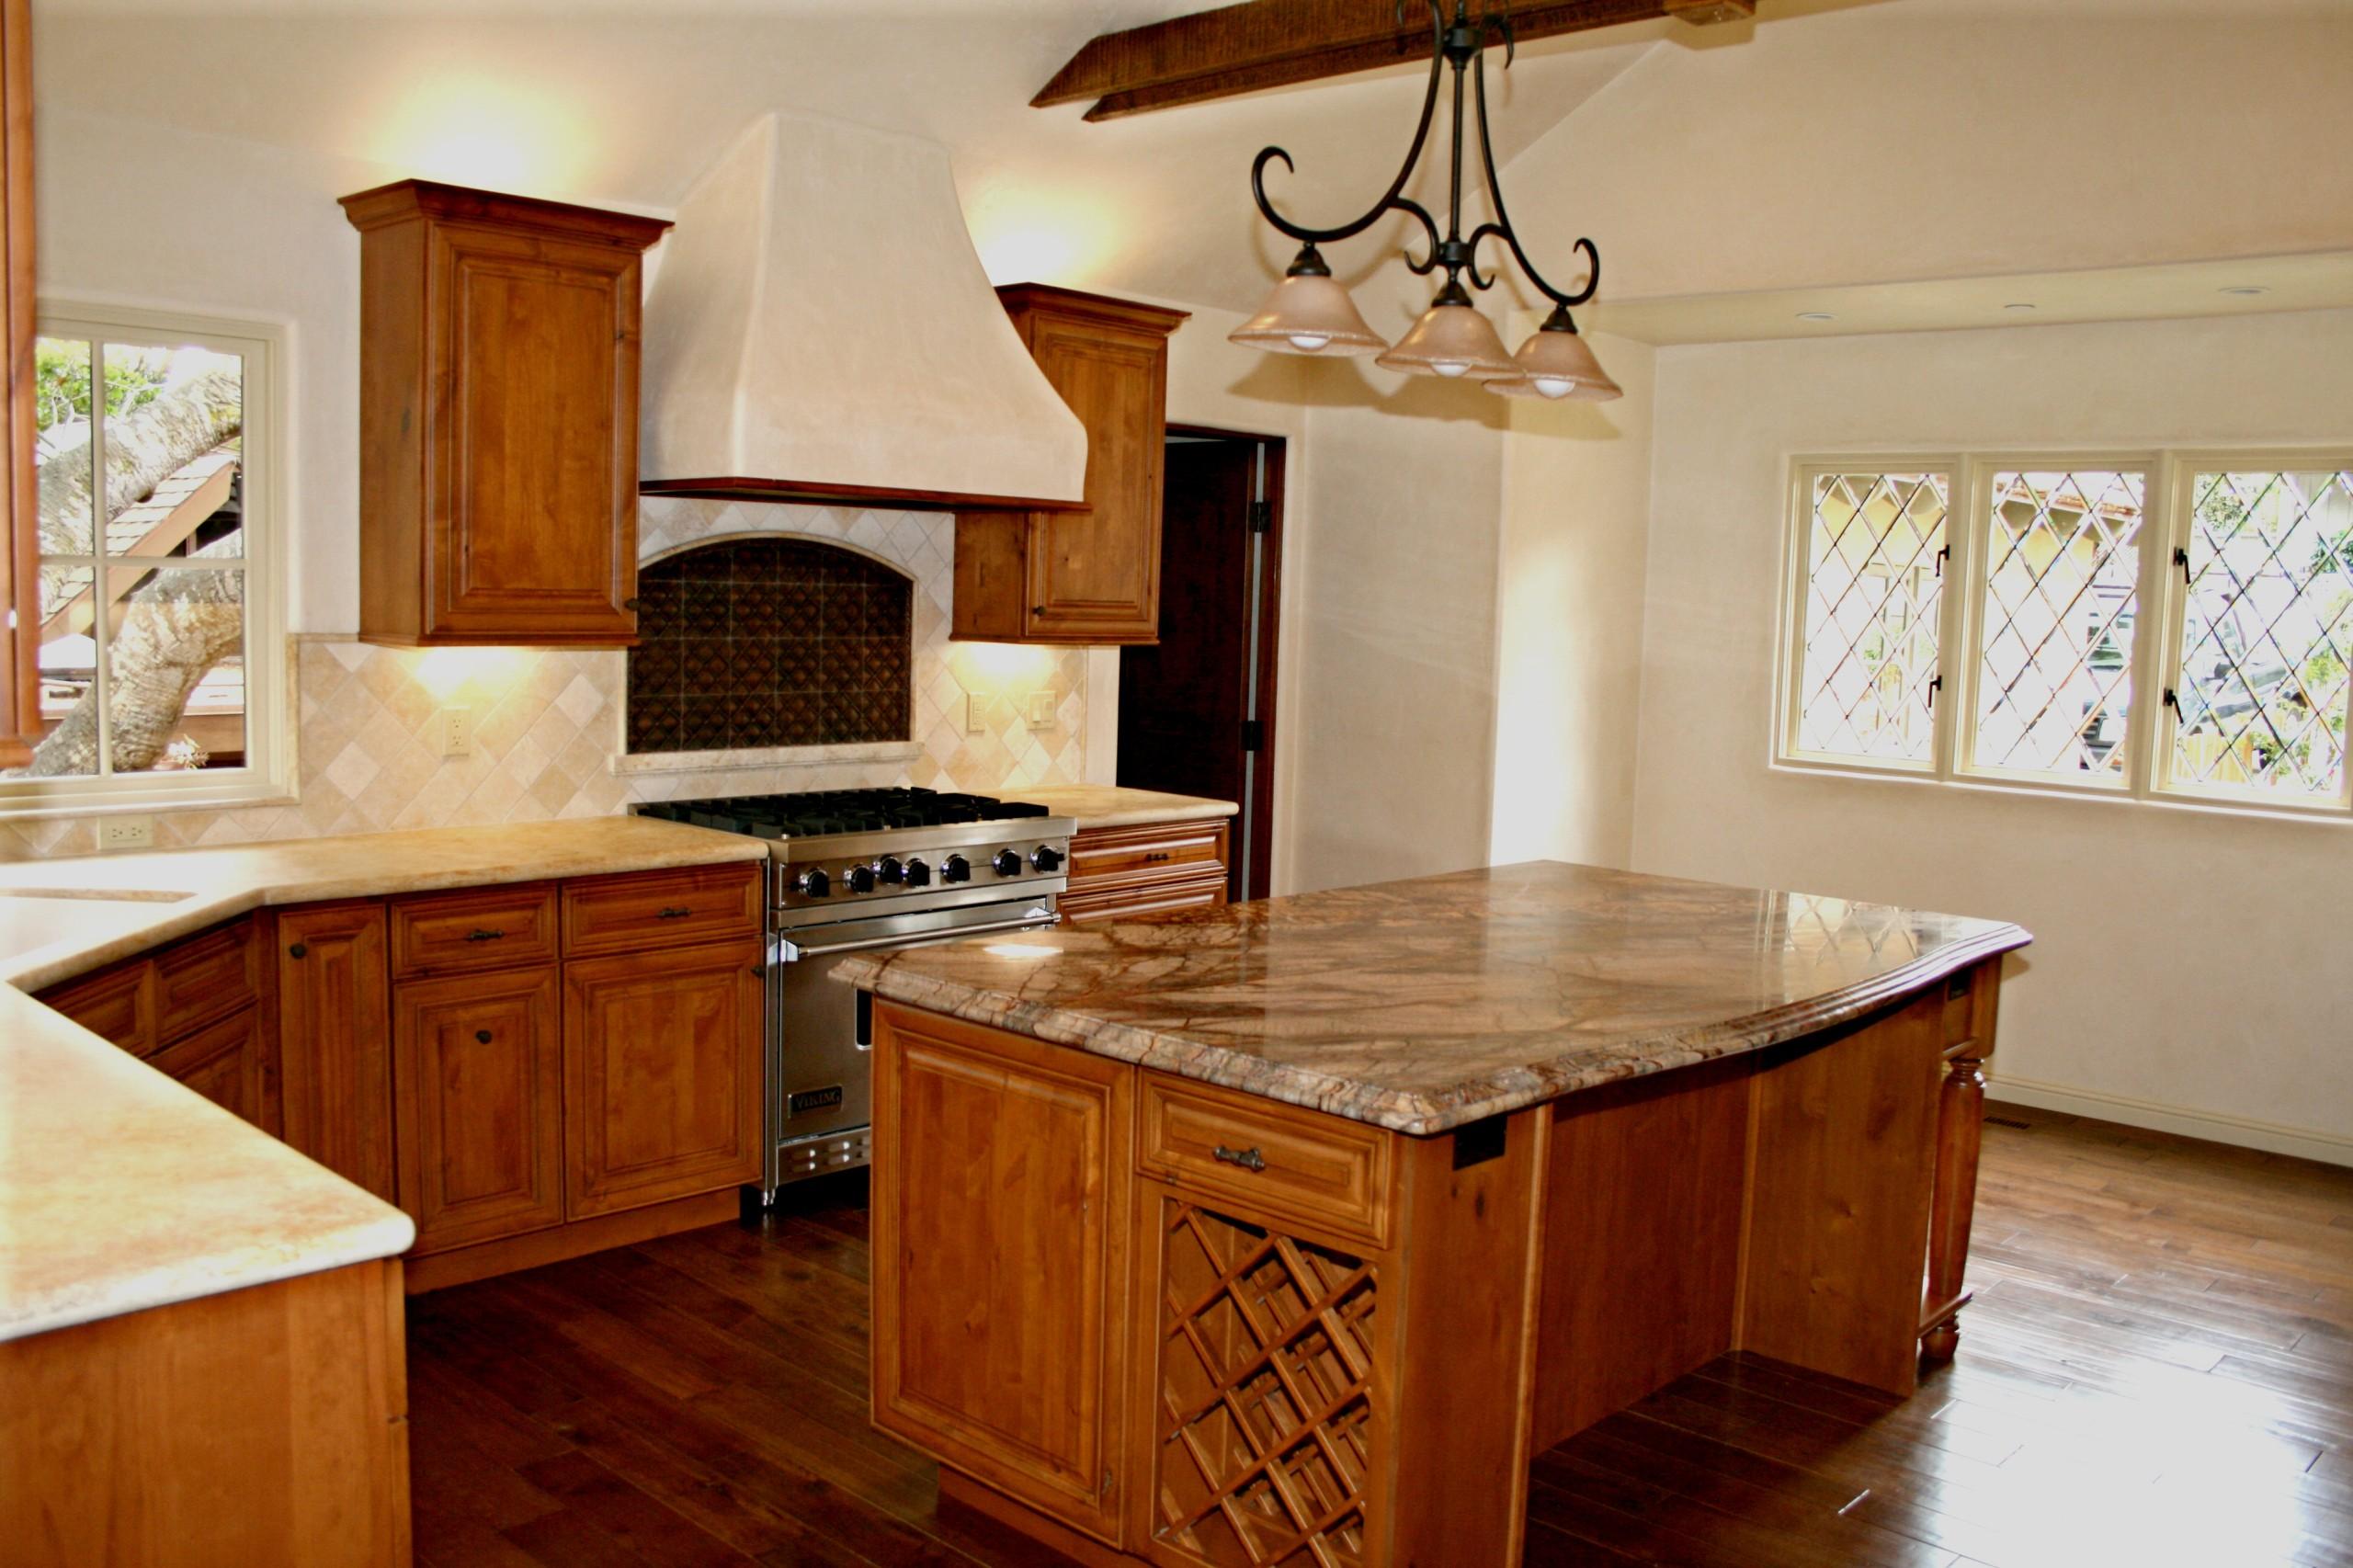 Kitchen-Carmel-Charmer-02